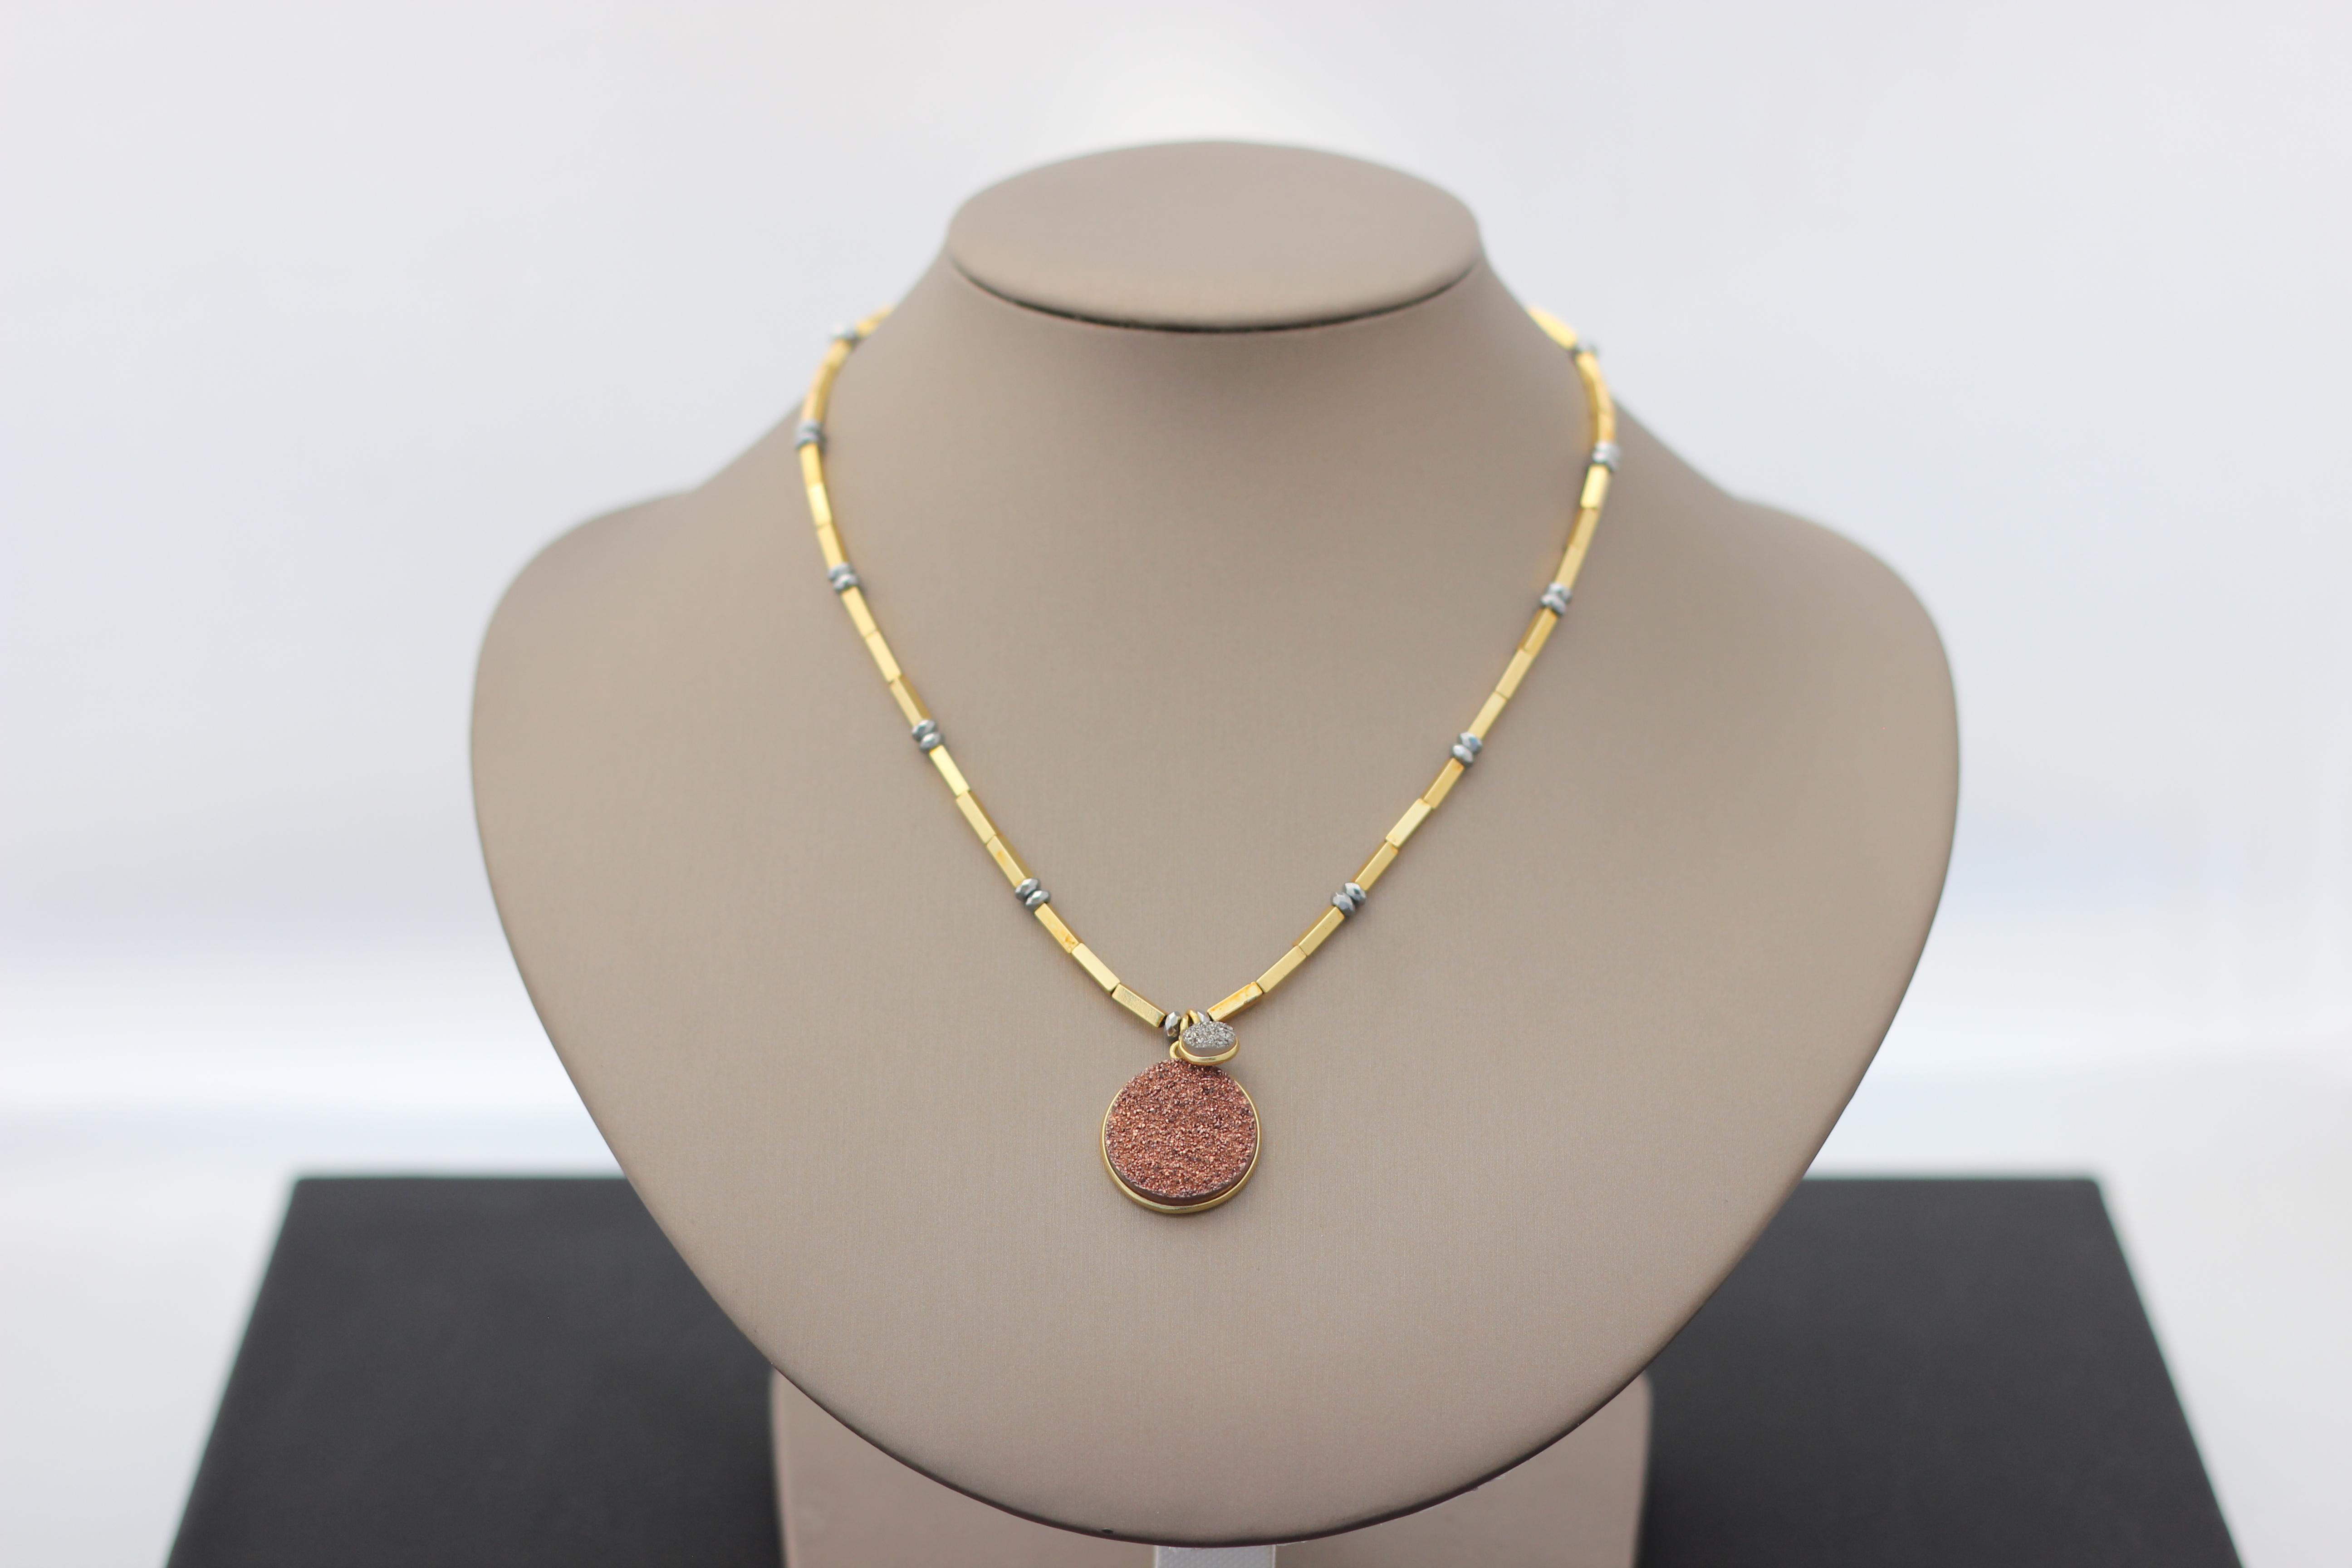 9. Hematite, Druzy | $94